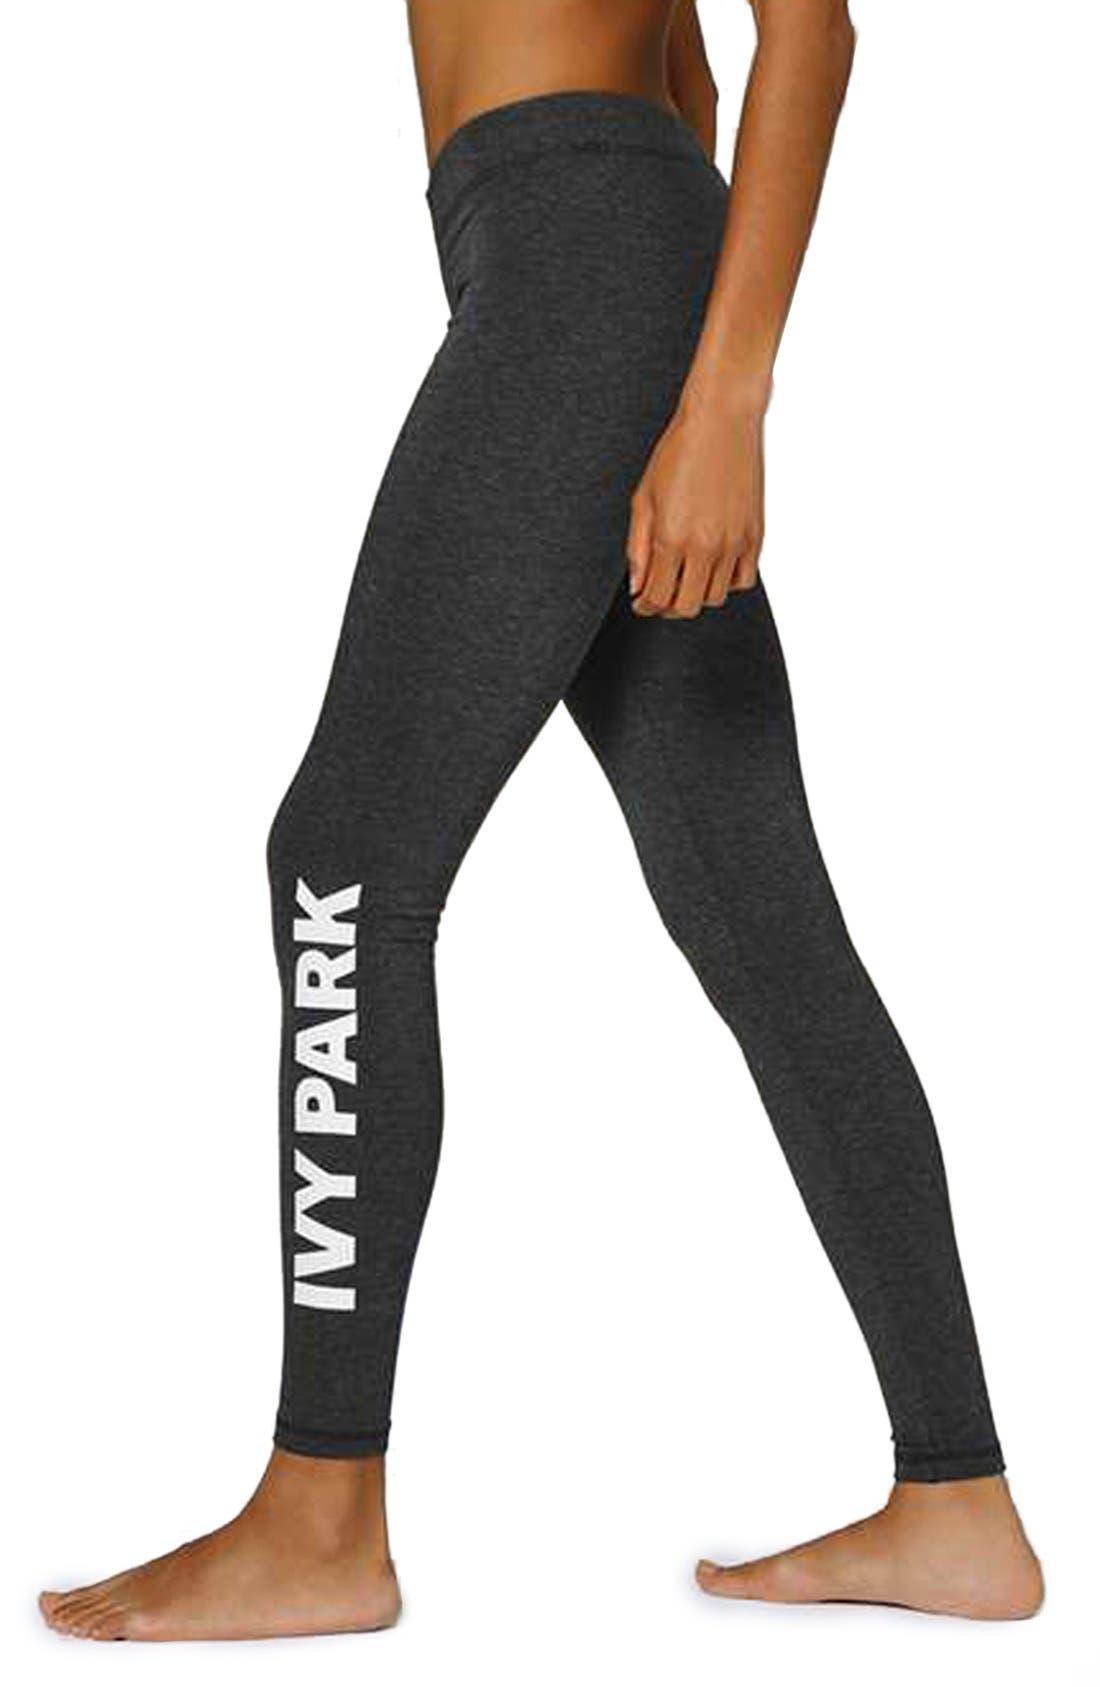 Main Image - IVY PARK® Logo Ankle Leggings